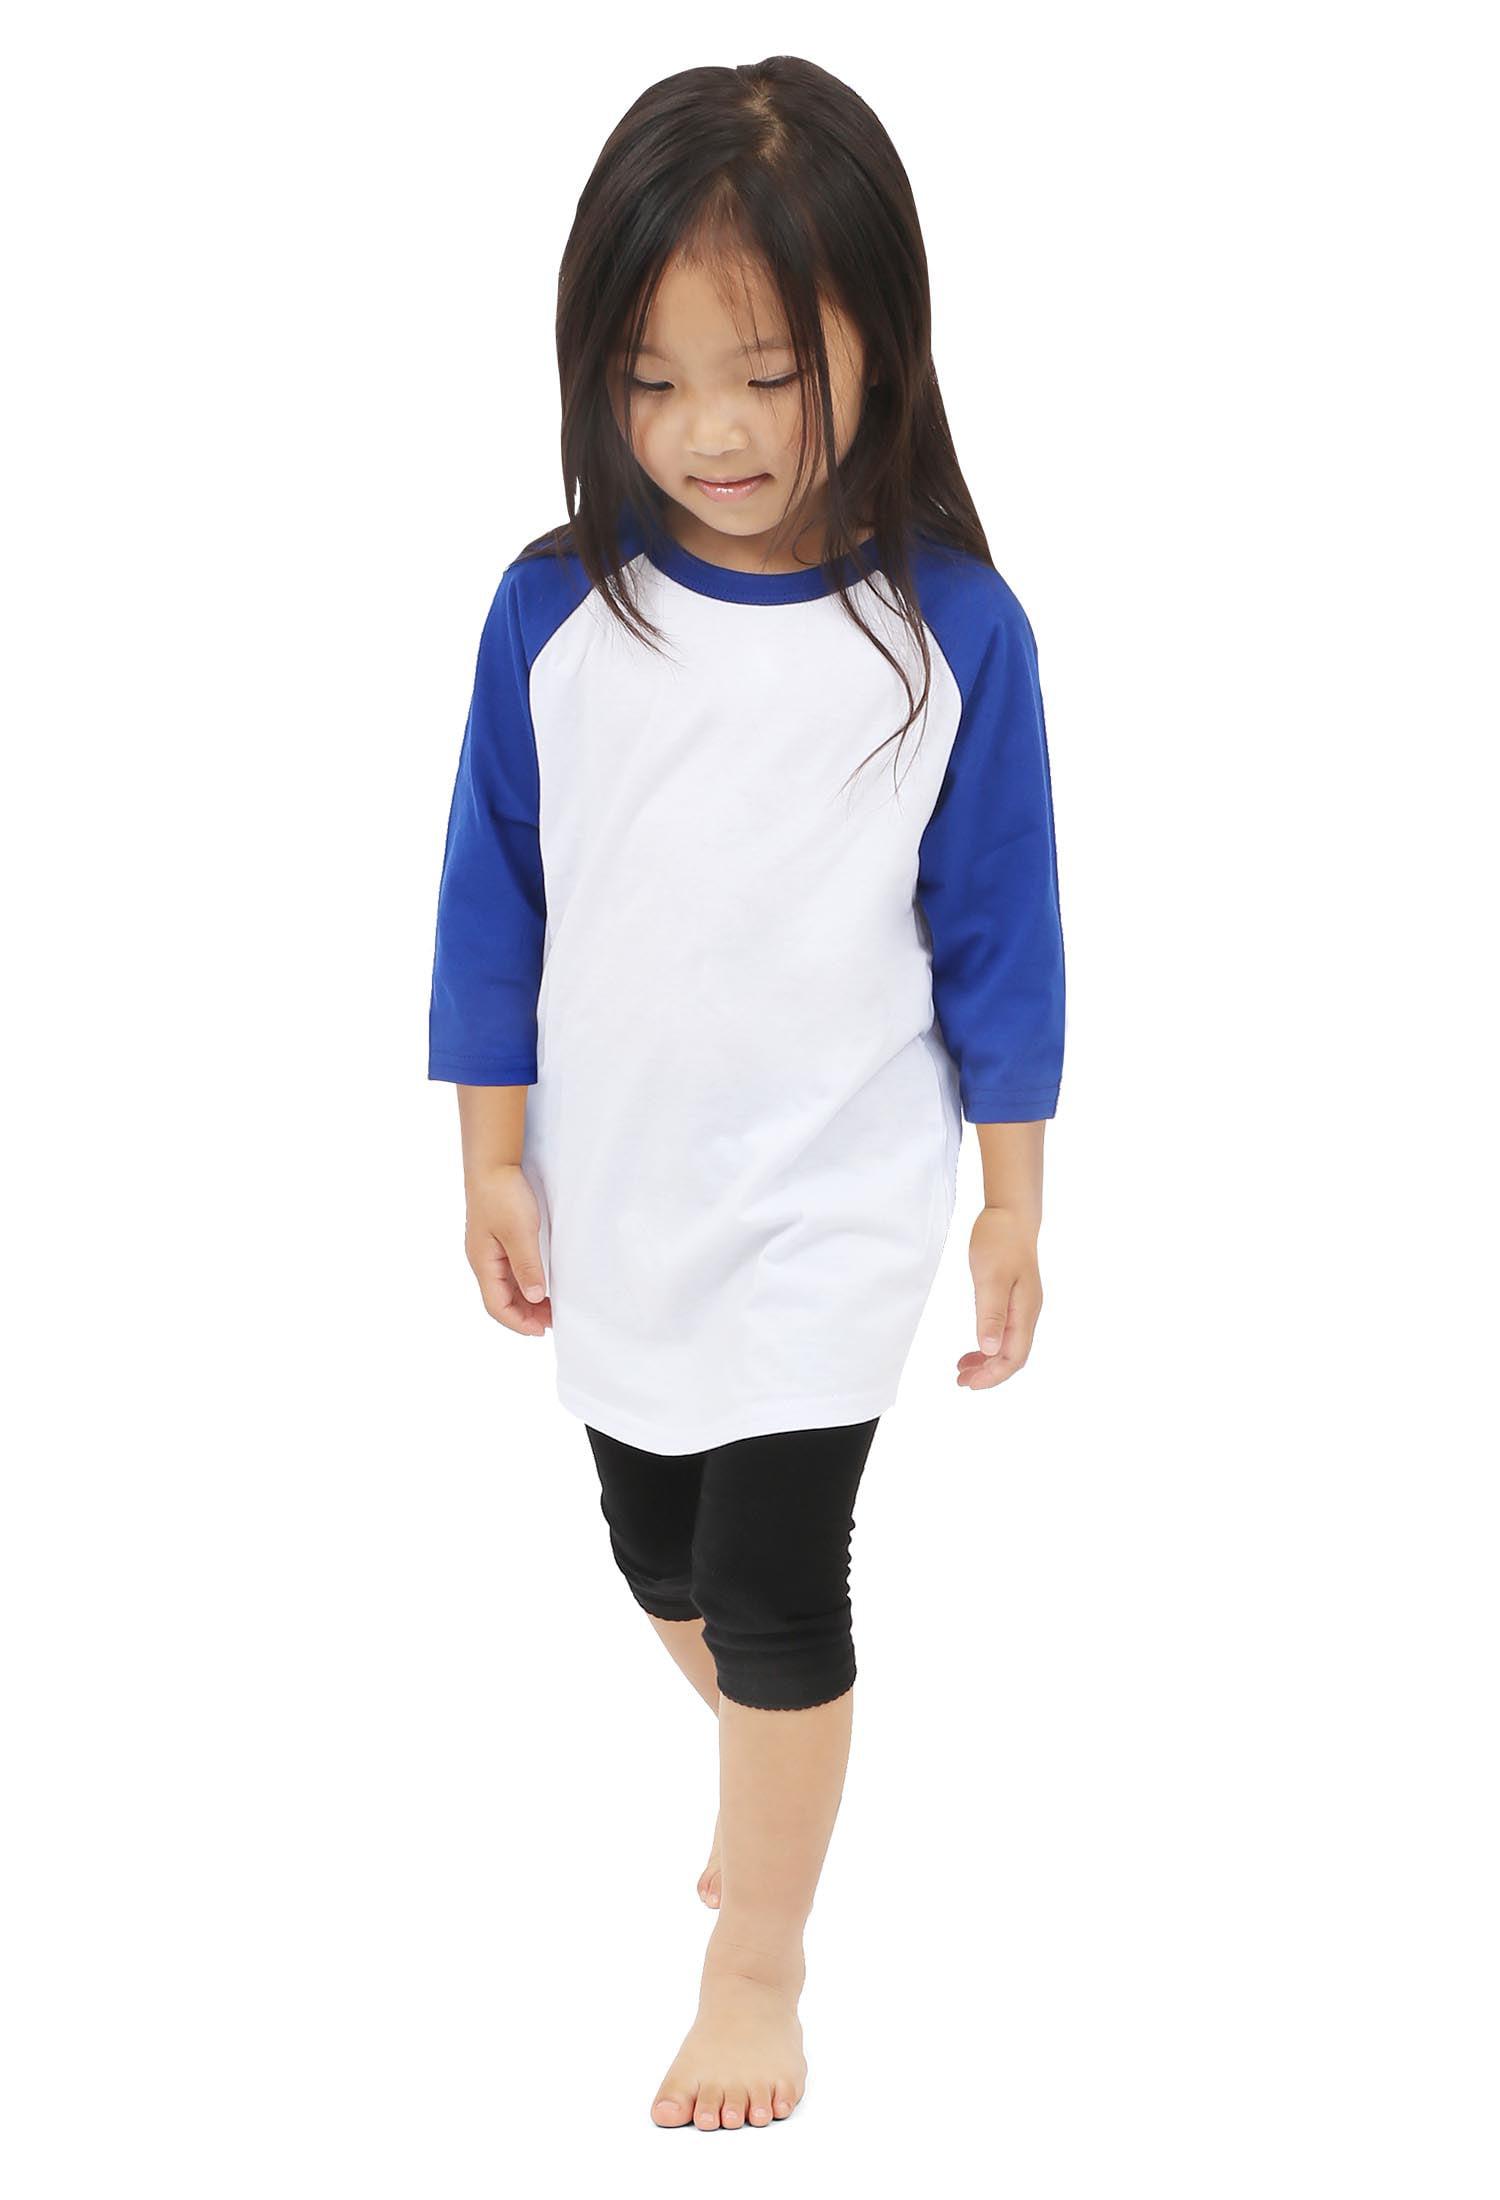 Kids Boys Girls T Shirts Plain American Baseball Long Raglan Sleeves Sports Tees